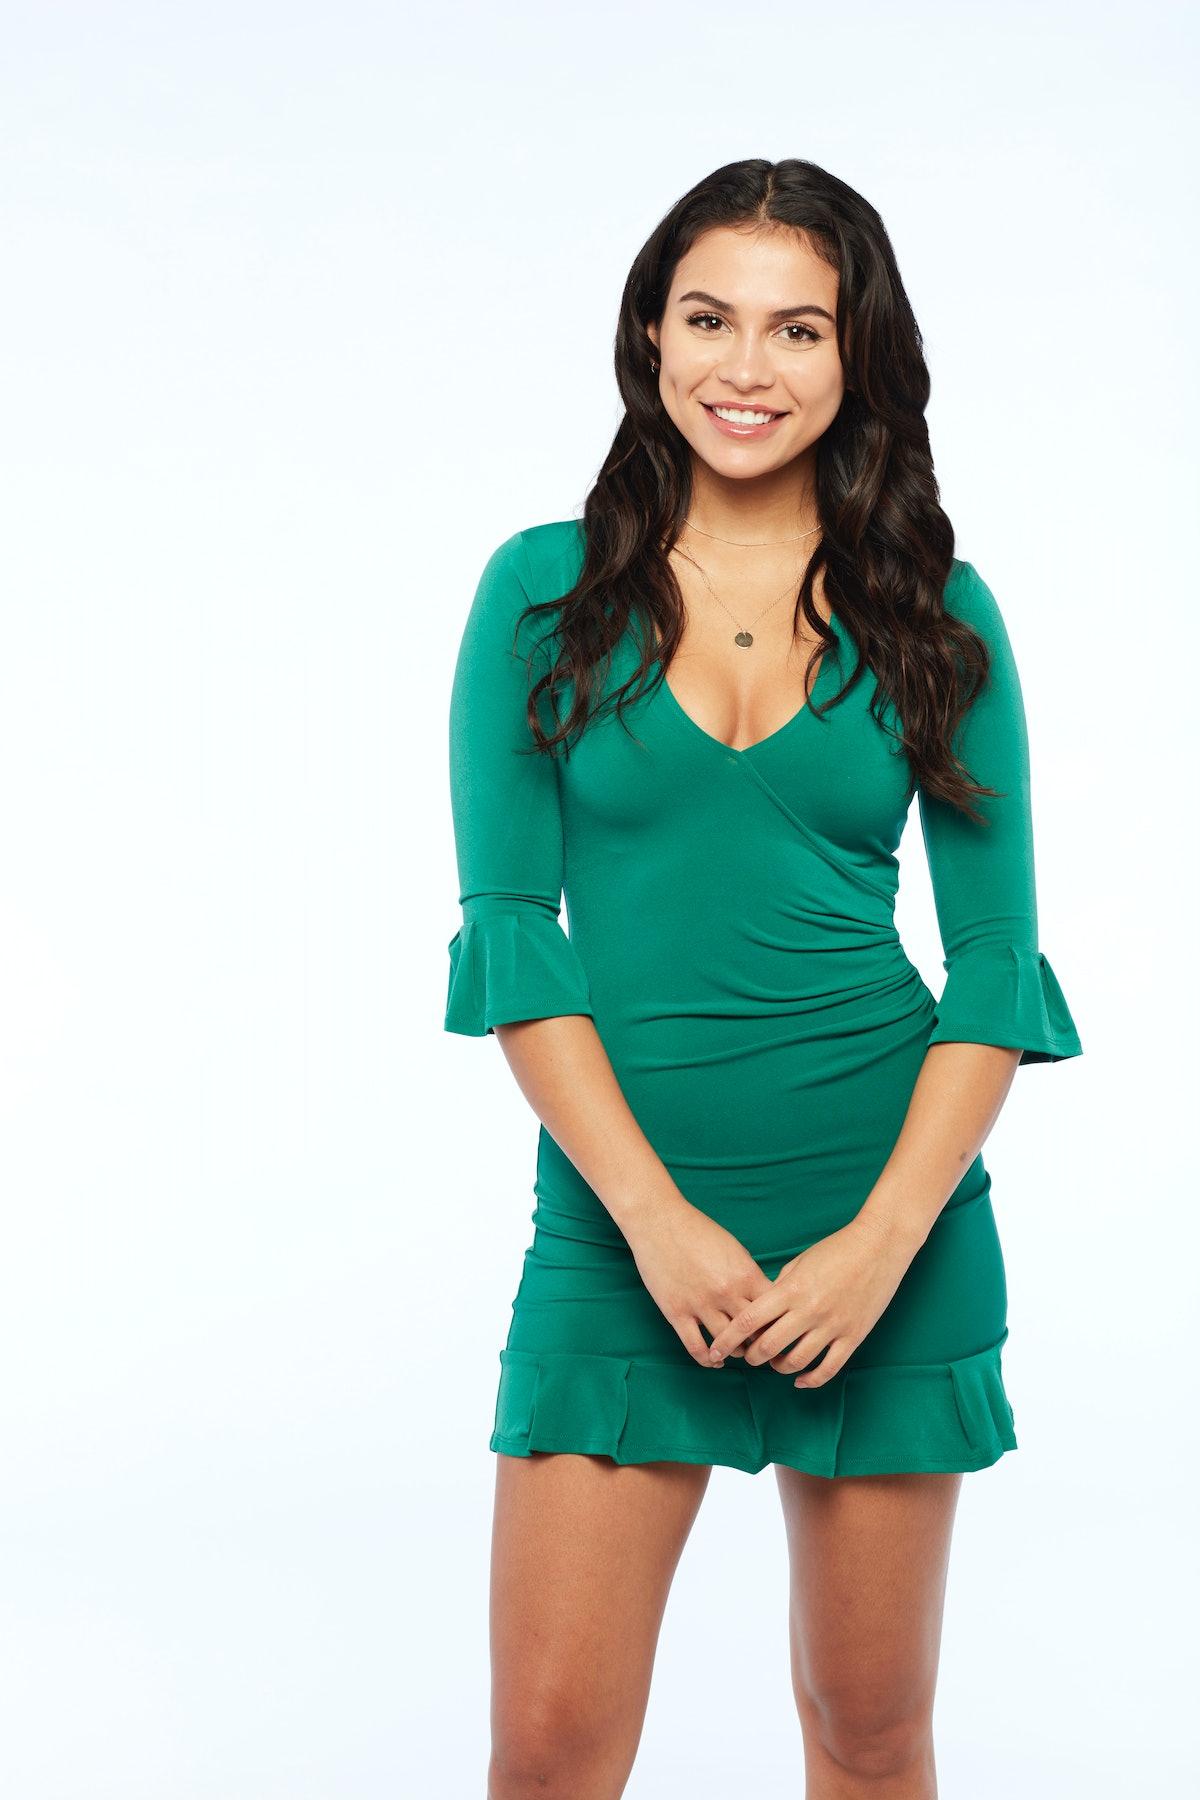 Who Is Brittany On Matt's 'Bachelor' Season?